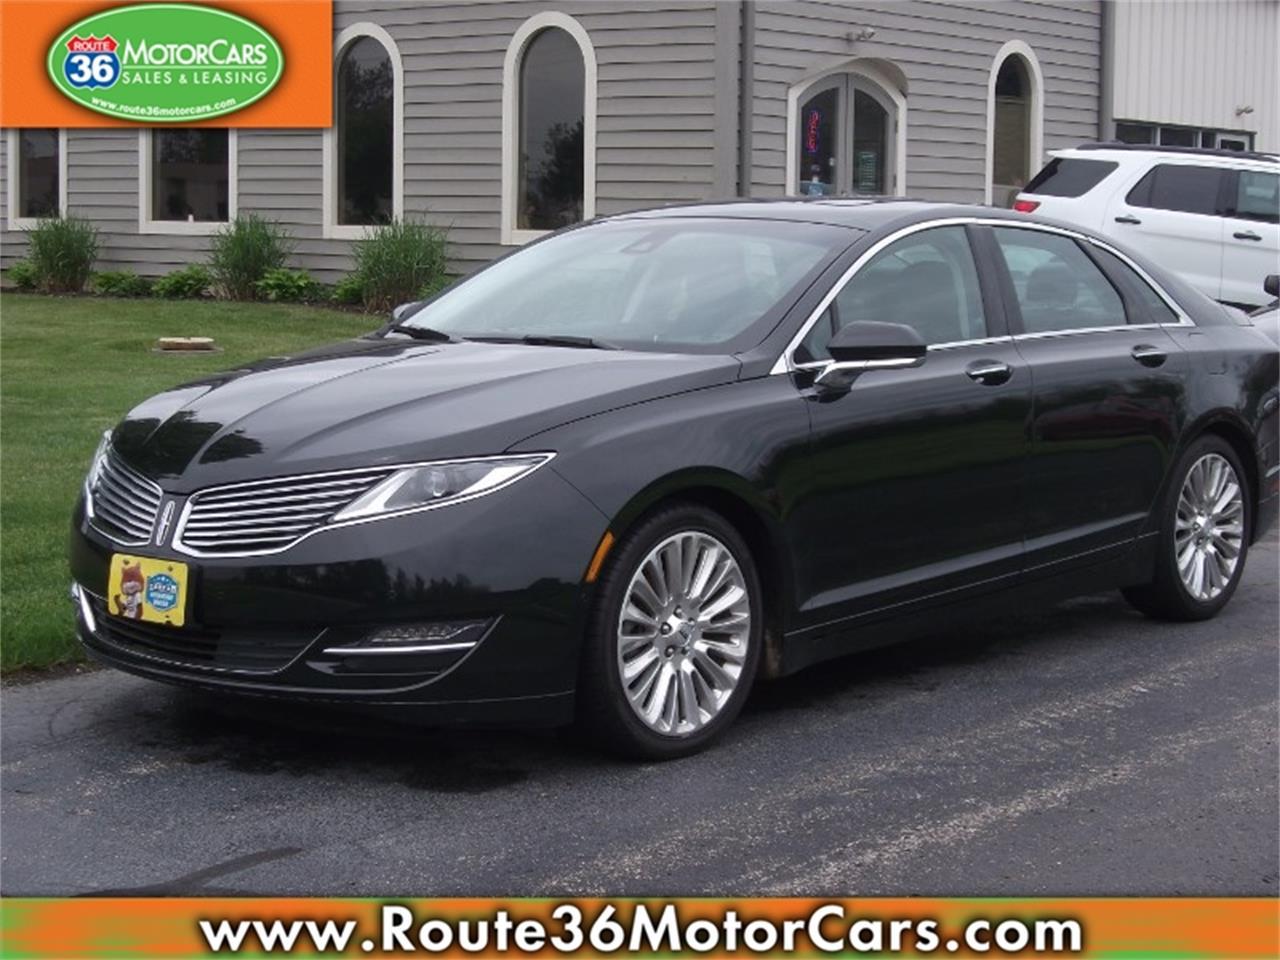 2013 Lincoln Mkz For Sale >> For Sale 2013 Lincoln Mkz In Dublin Ohio